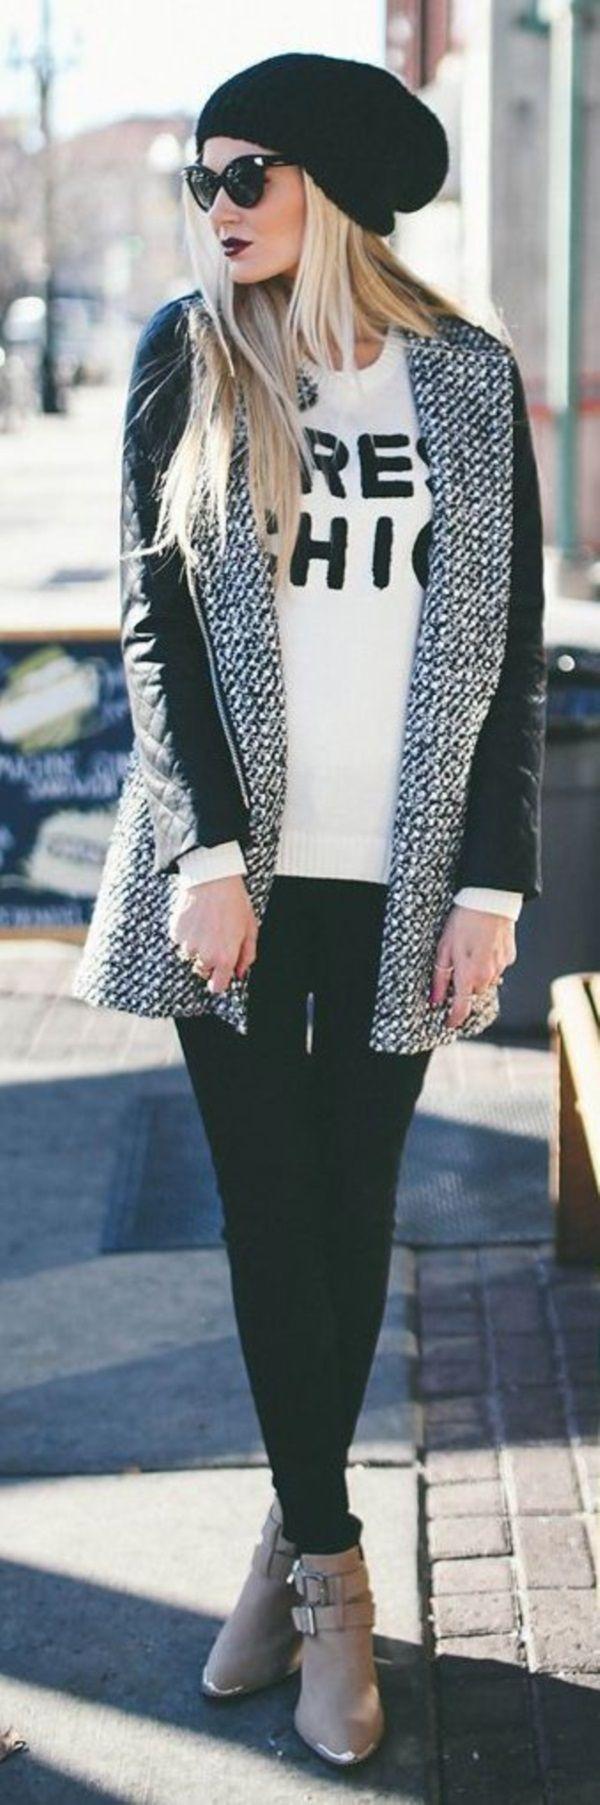 40 Edgy Fashion Ideas For Women | http://fashion.ekstrax.com/2015/02/edgy-fashion-ideas-for-women.html